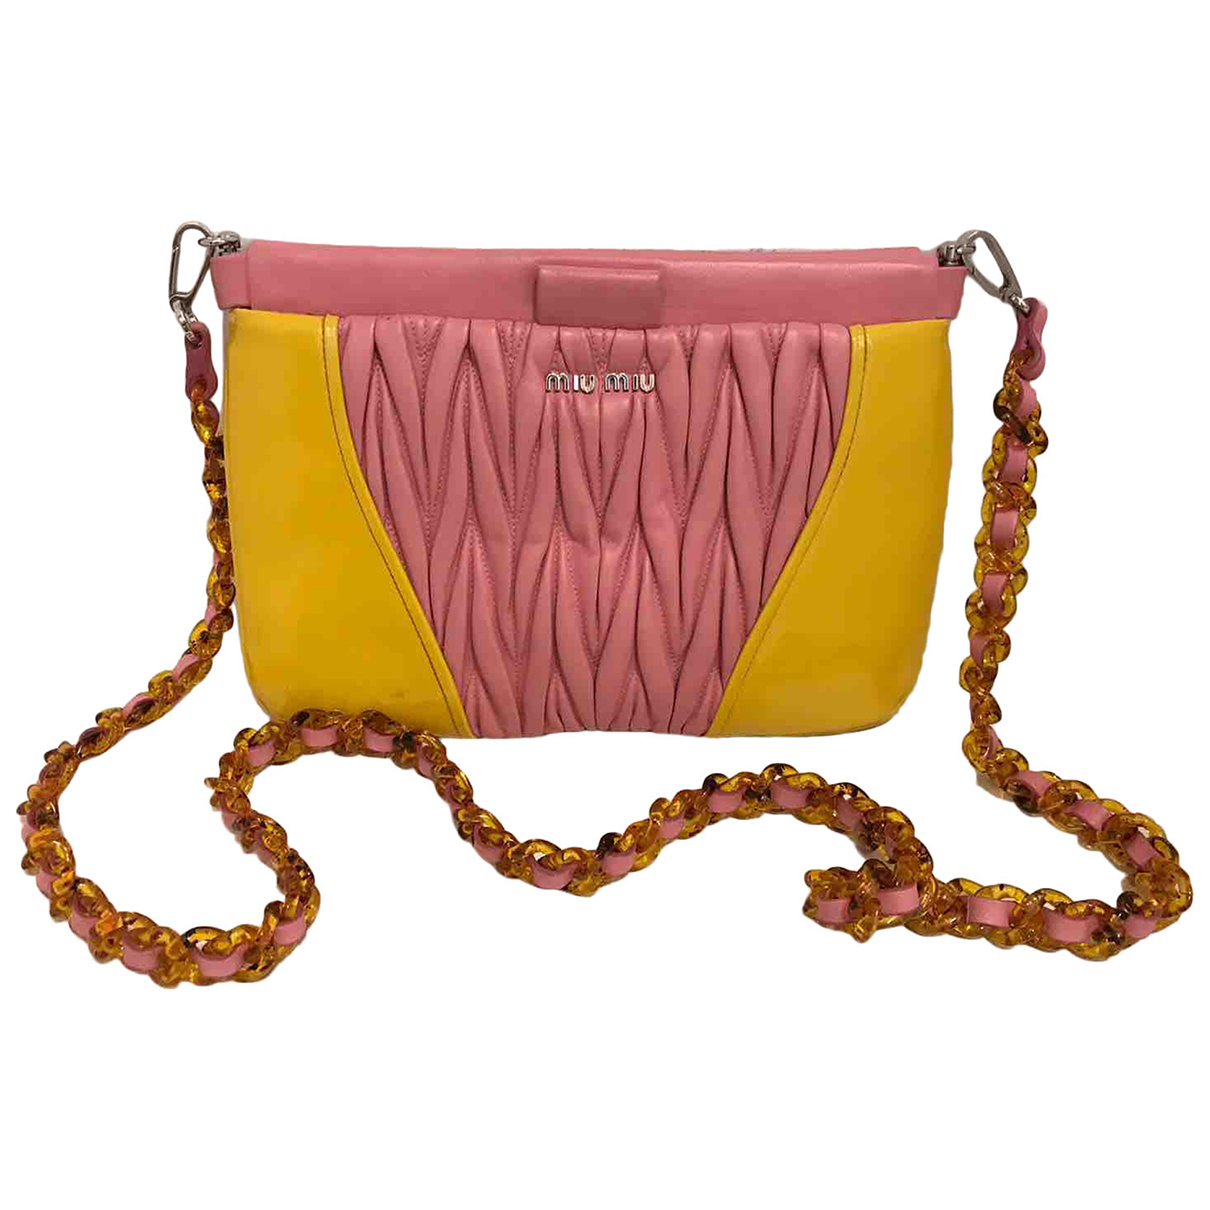 Miu Miu \N Multicolour Leather Clutch bag for Women \N